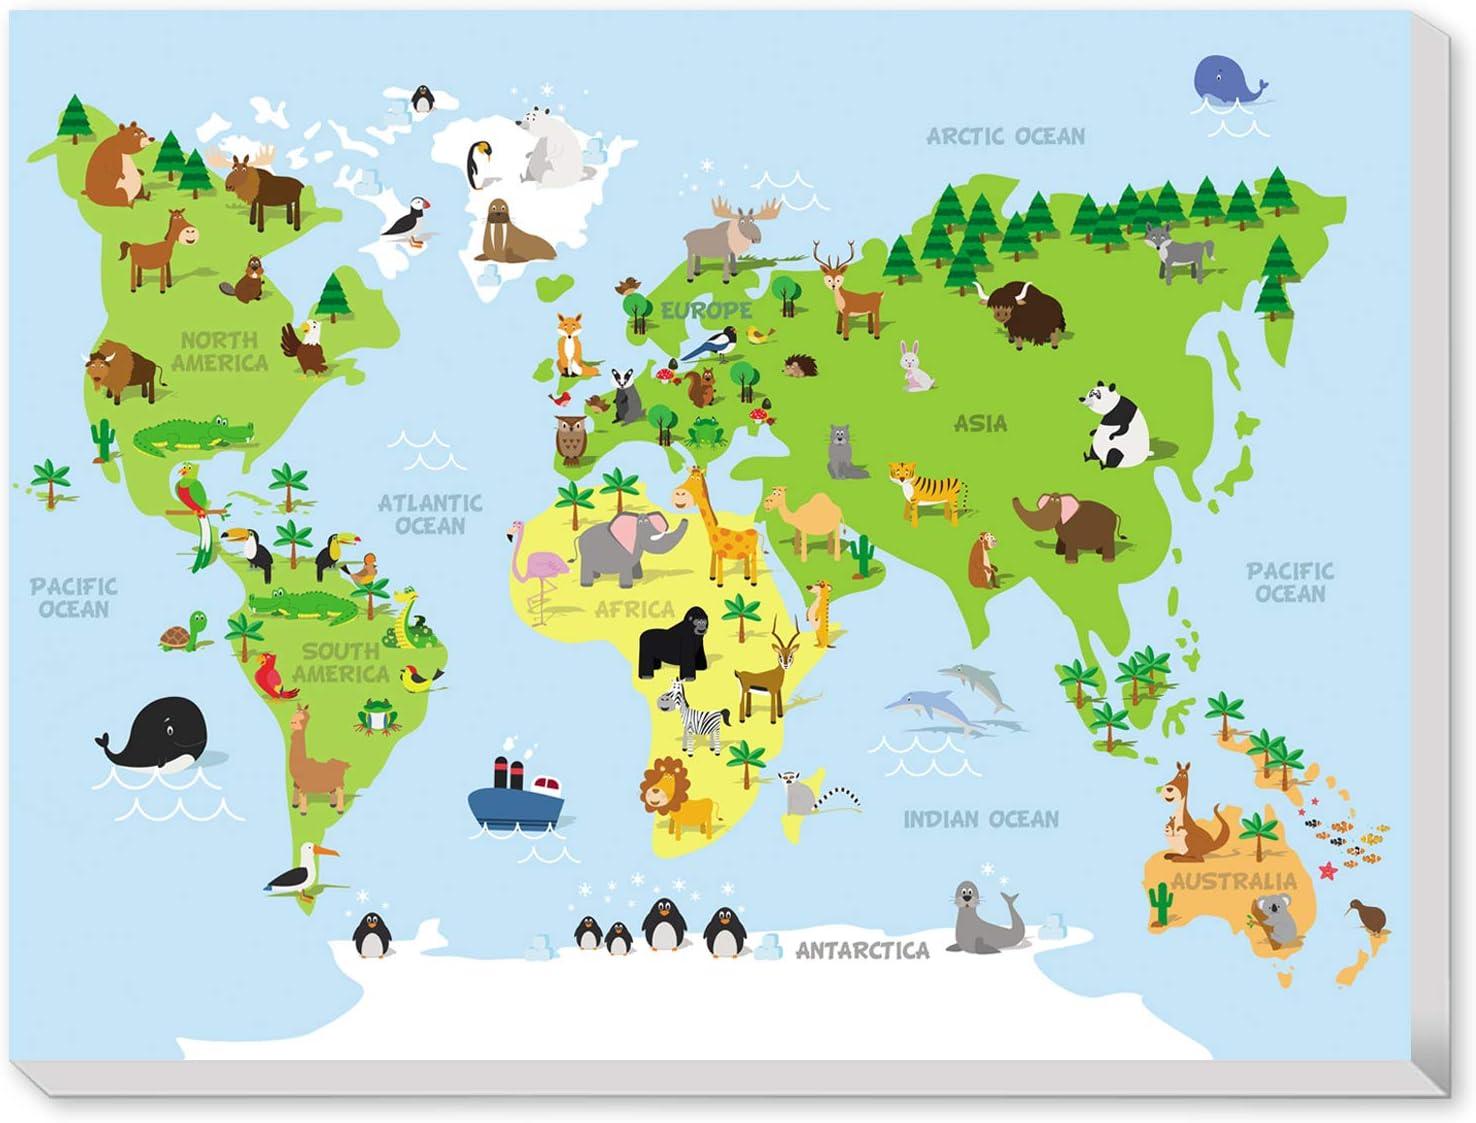 Texture of Dreams Kids Zoo Animal World Map Print Wall Art Canvas, Children Educational Developmental Fun Animal Map of The World, Baby Room Design Nursery Decor Large Canvas Prints (18